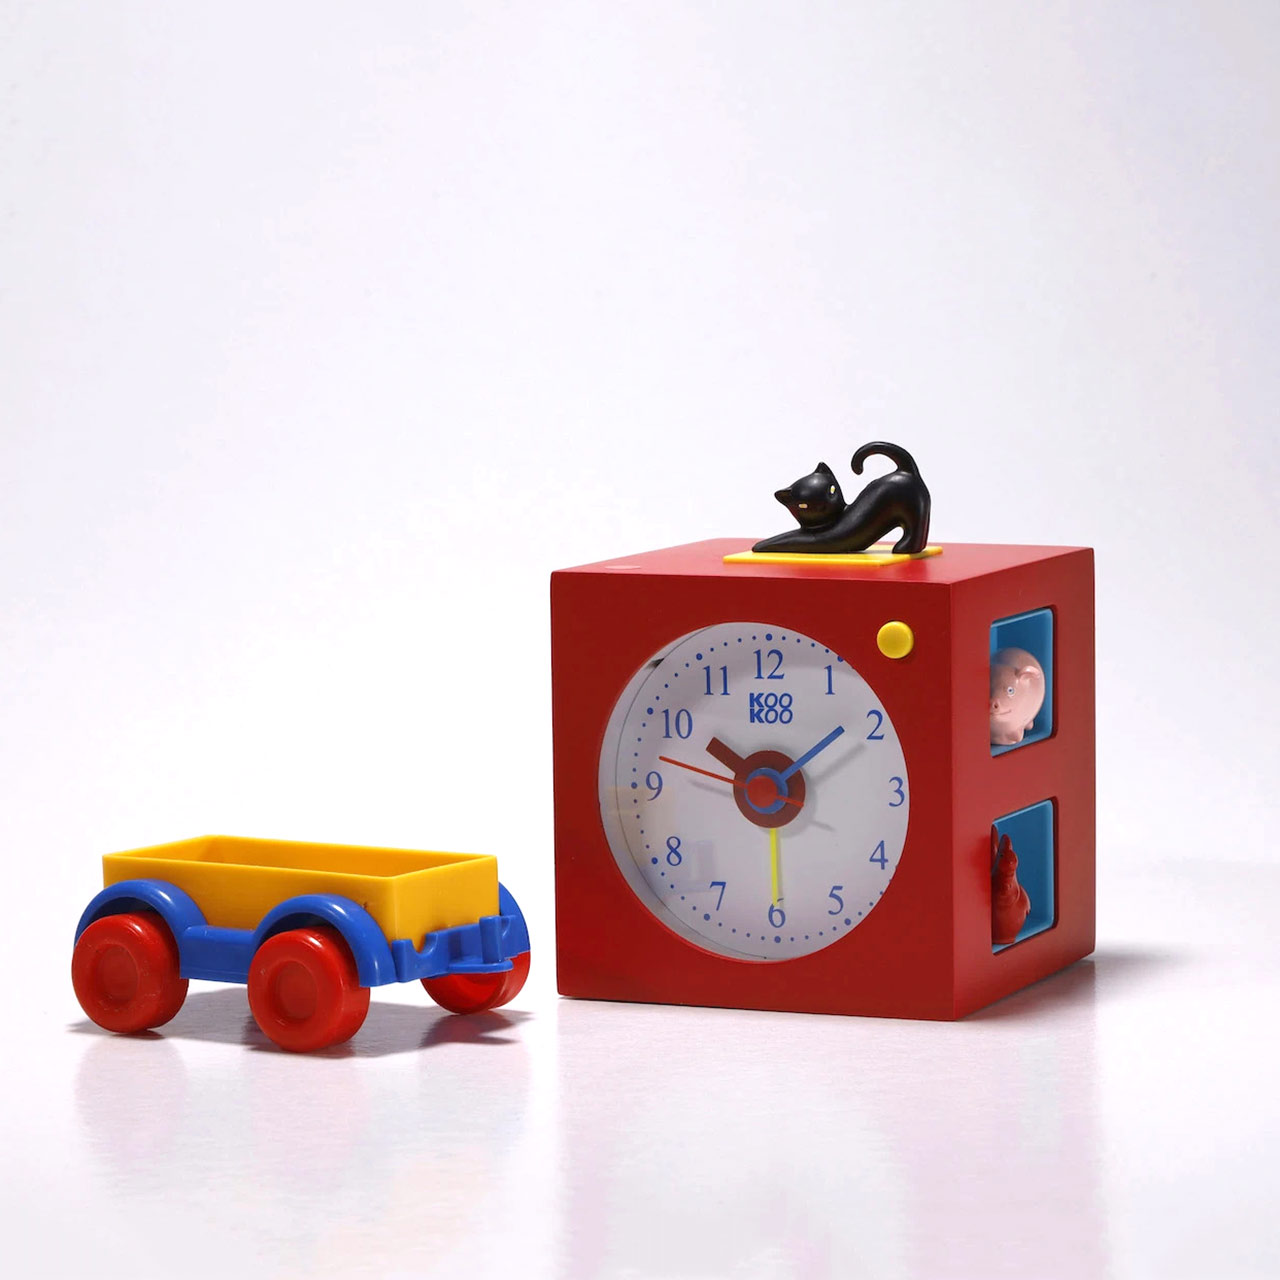 KidsAlarm red alarm clock | the design gift shop